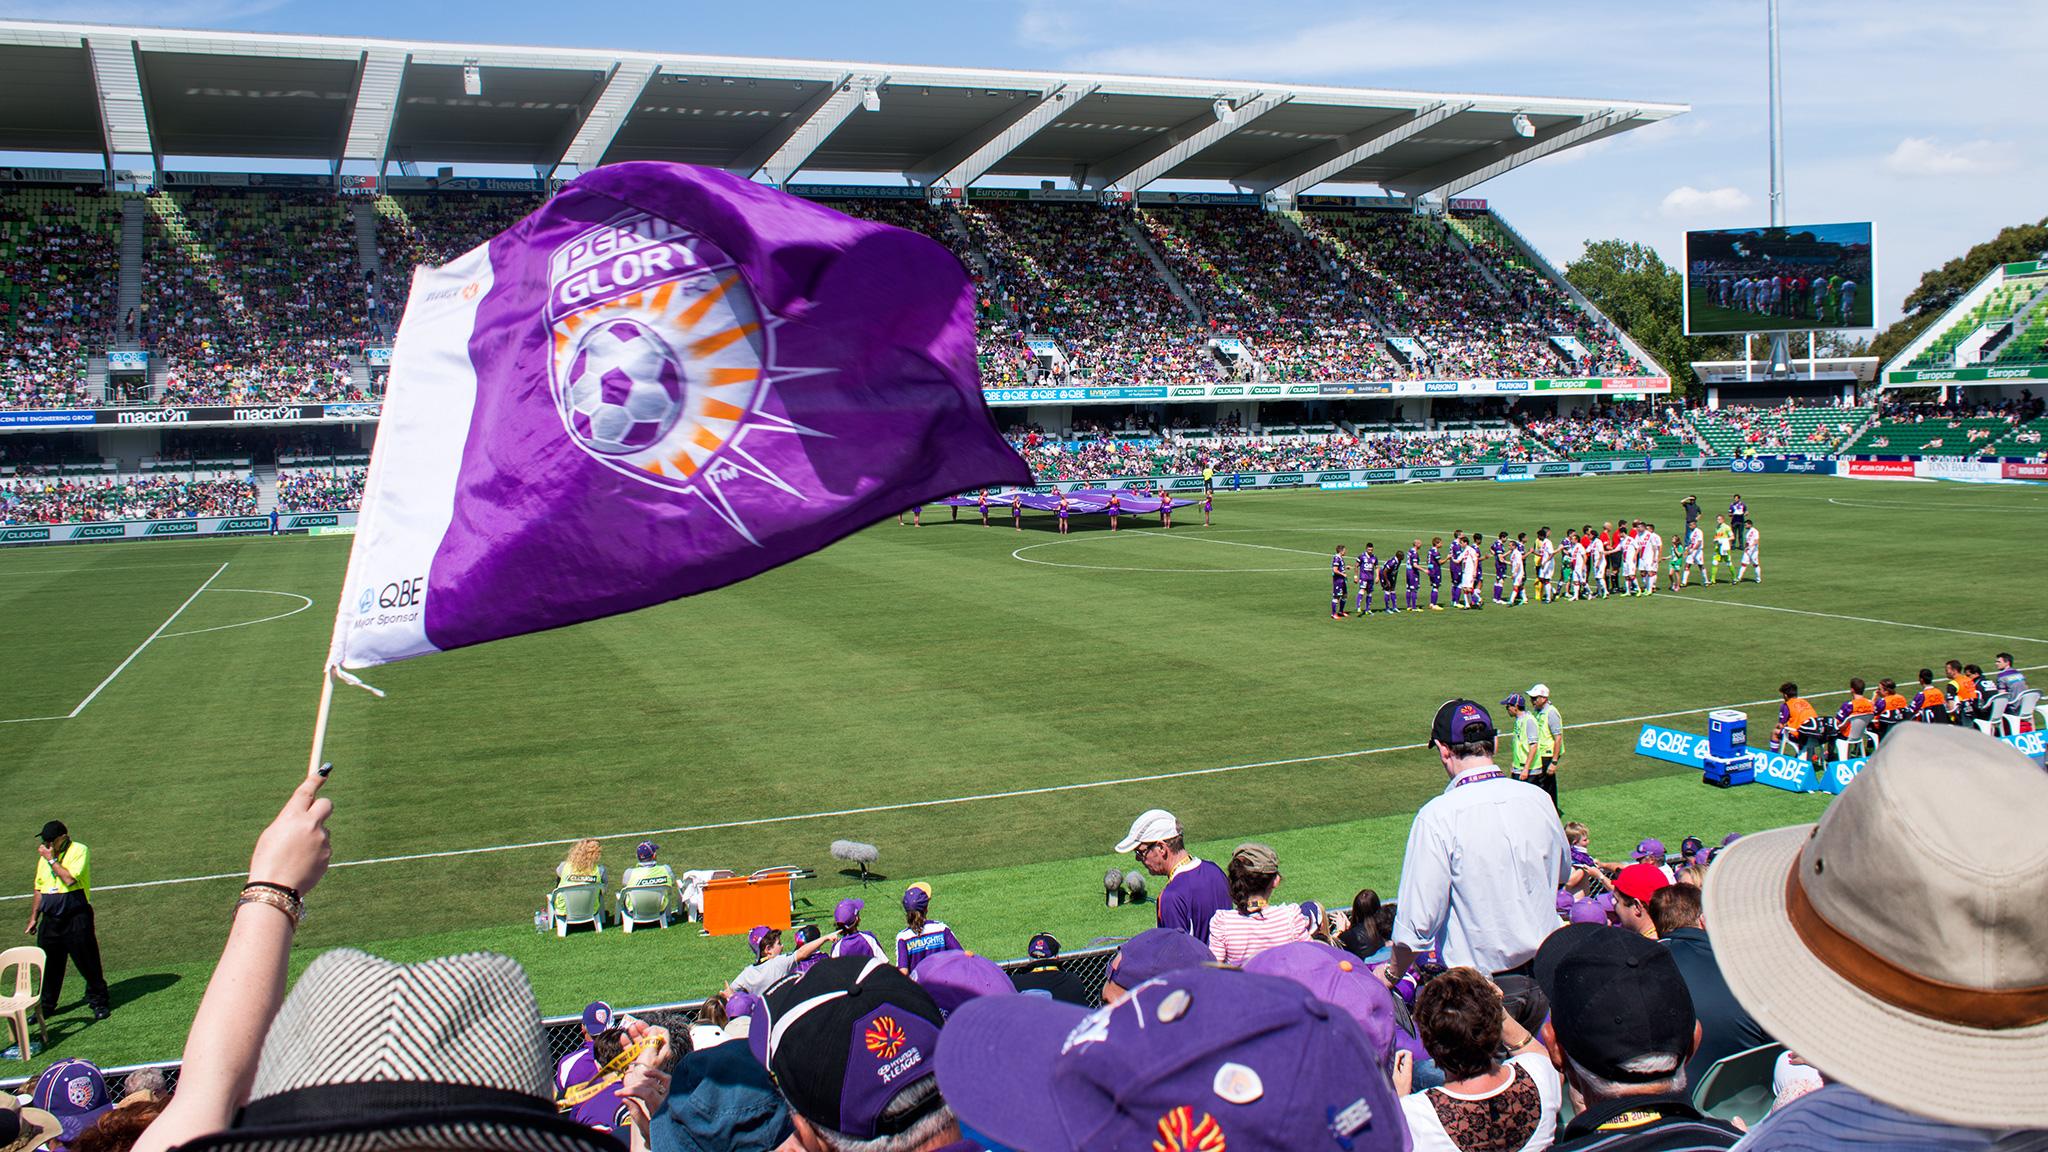 perth glory fc - NIB StadiumCapacity: 20500